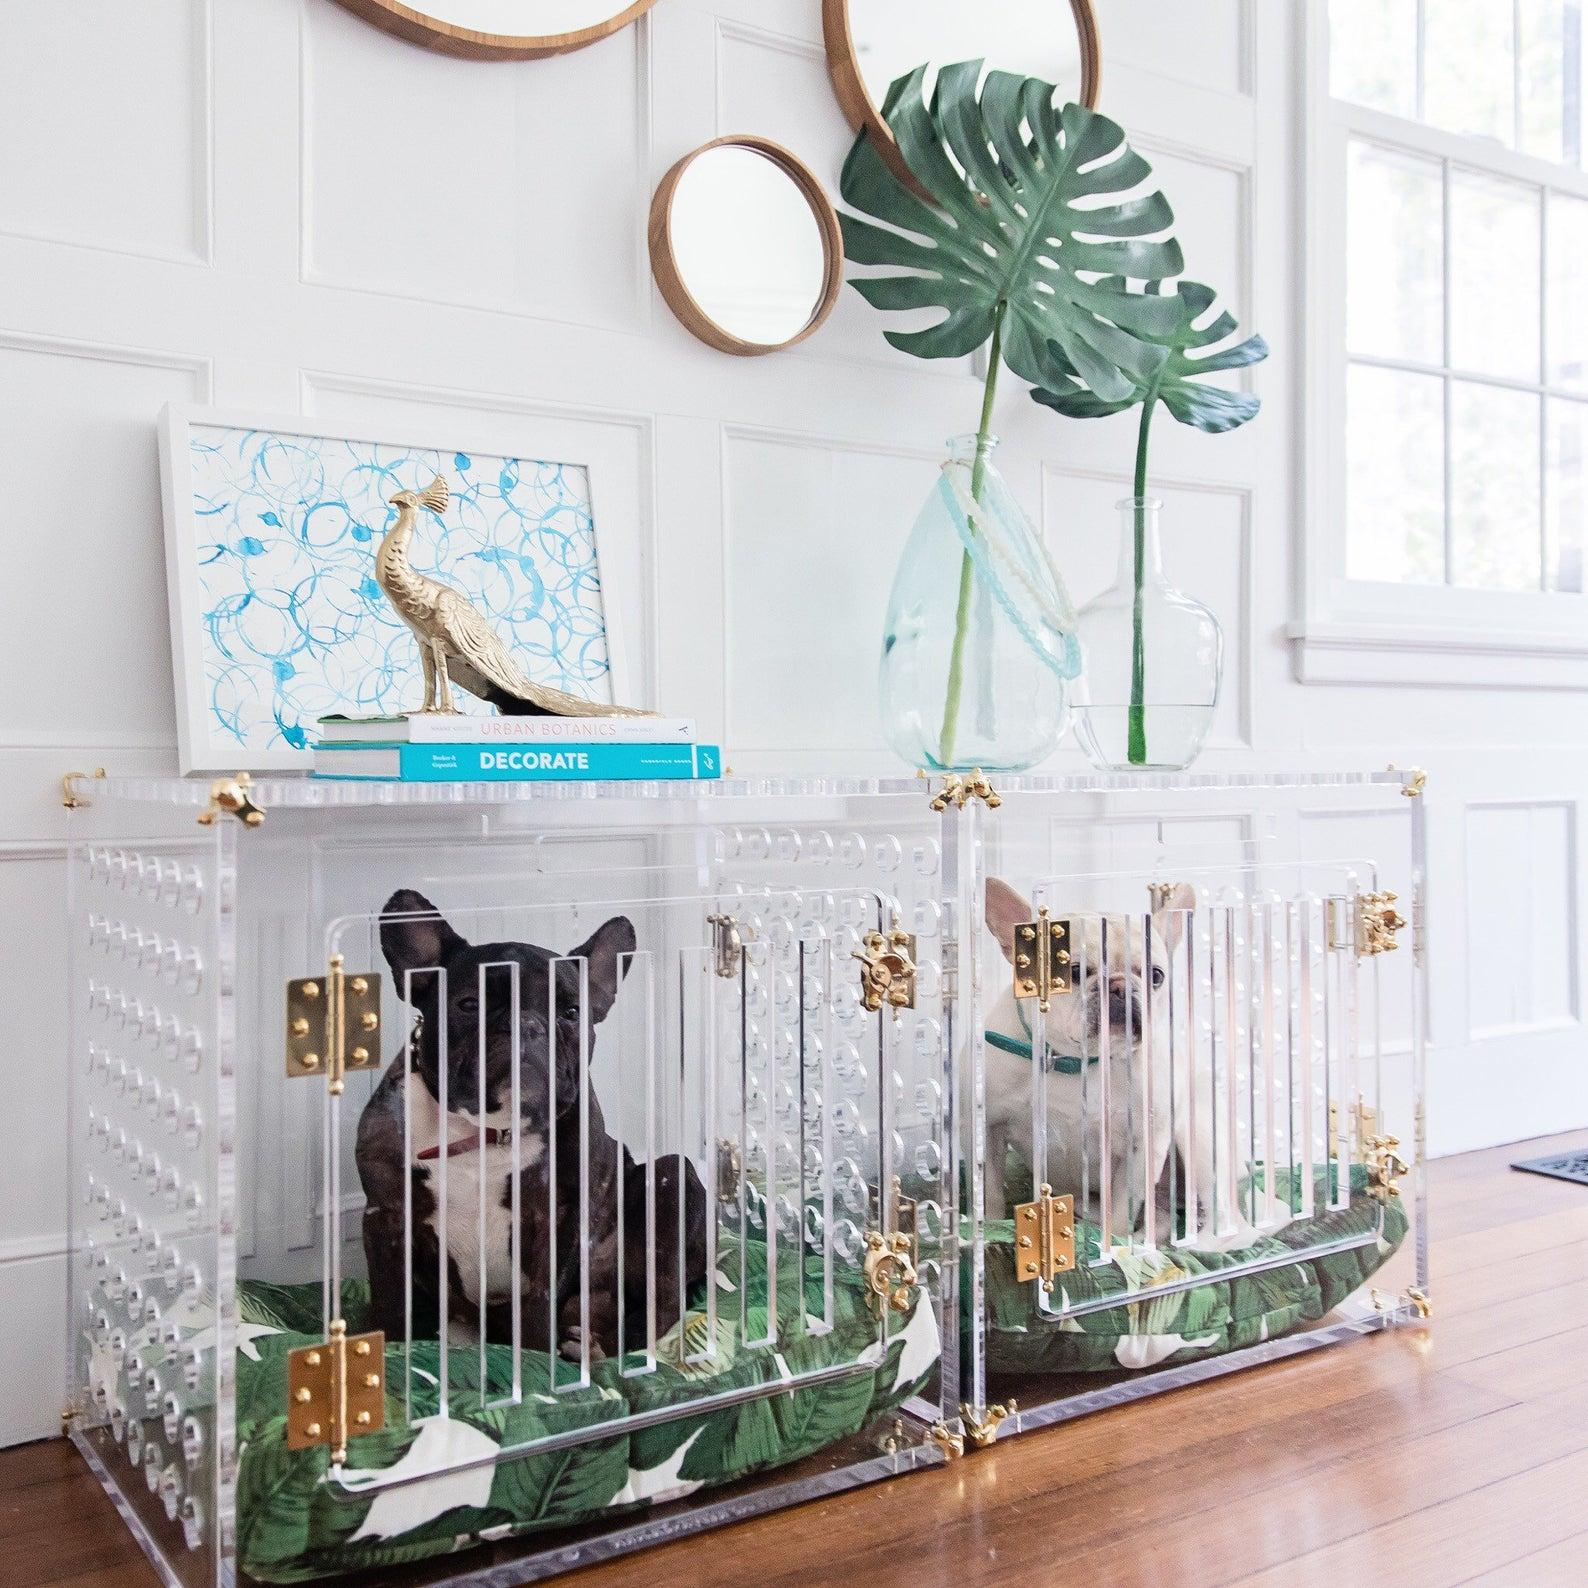 Medio Pretty Kennel for Dogs 11-24 lbs via Pretty Kennels (Etsy)